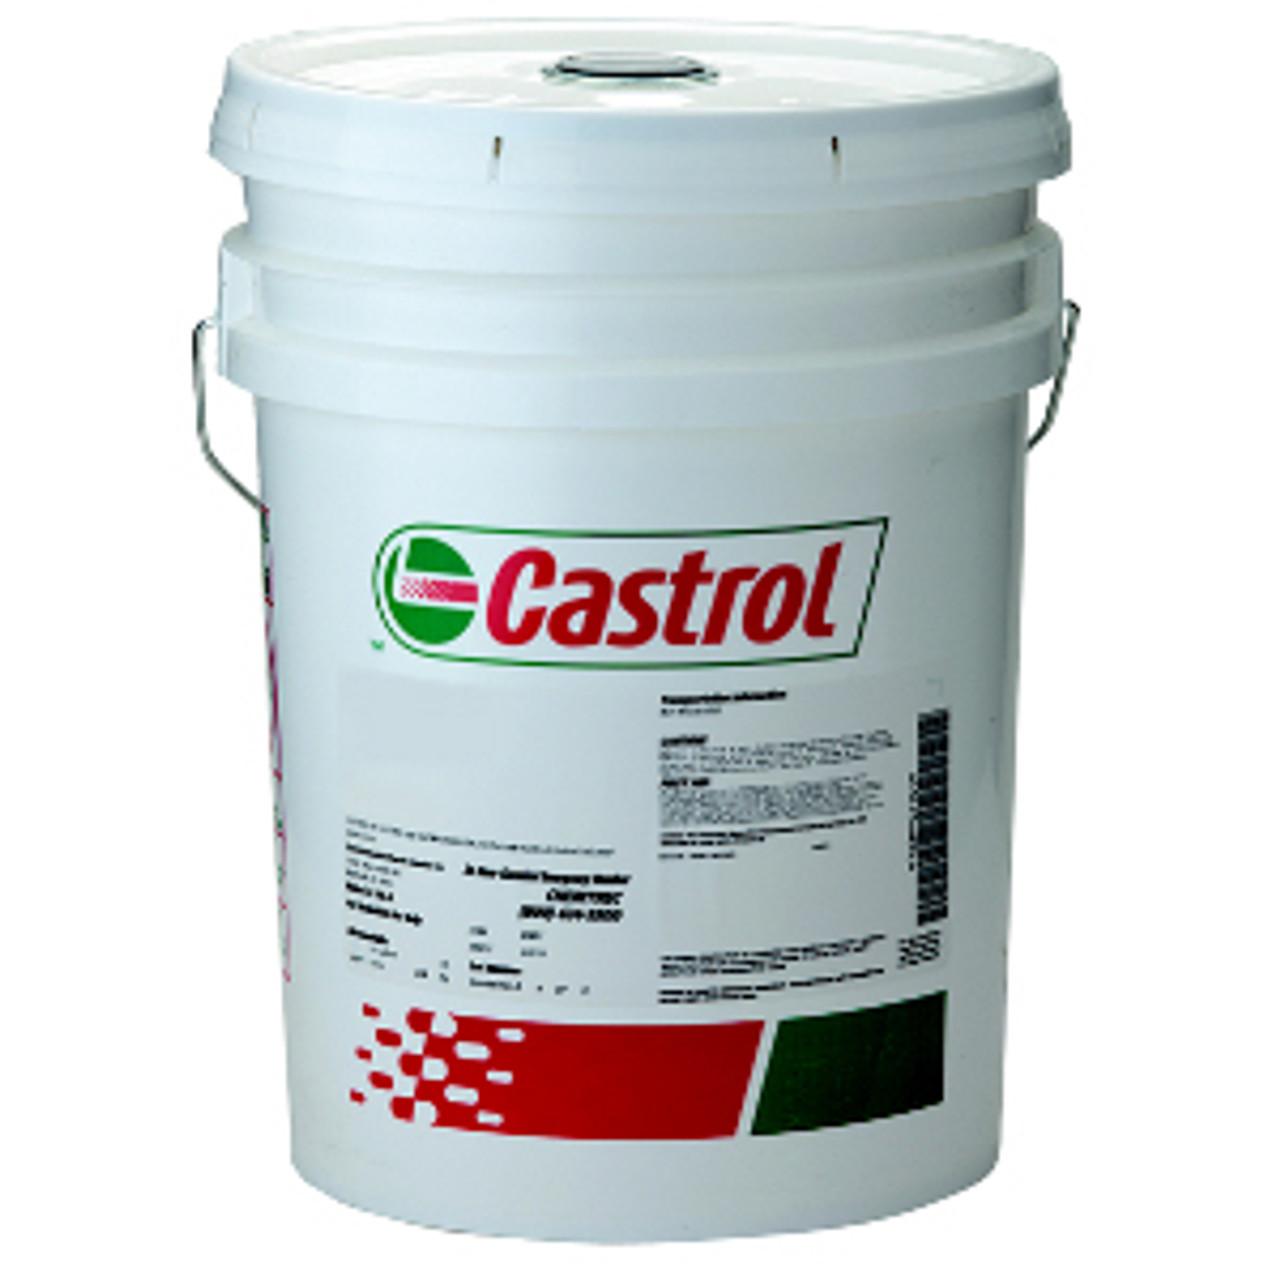 Castrol Rustilo™ 4135 HF Dewatering Corrosion Preventive - 5 gal Pail